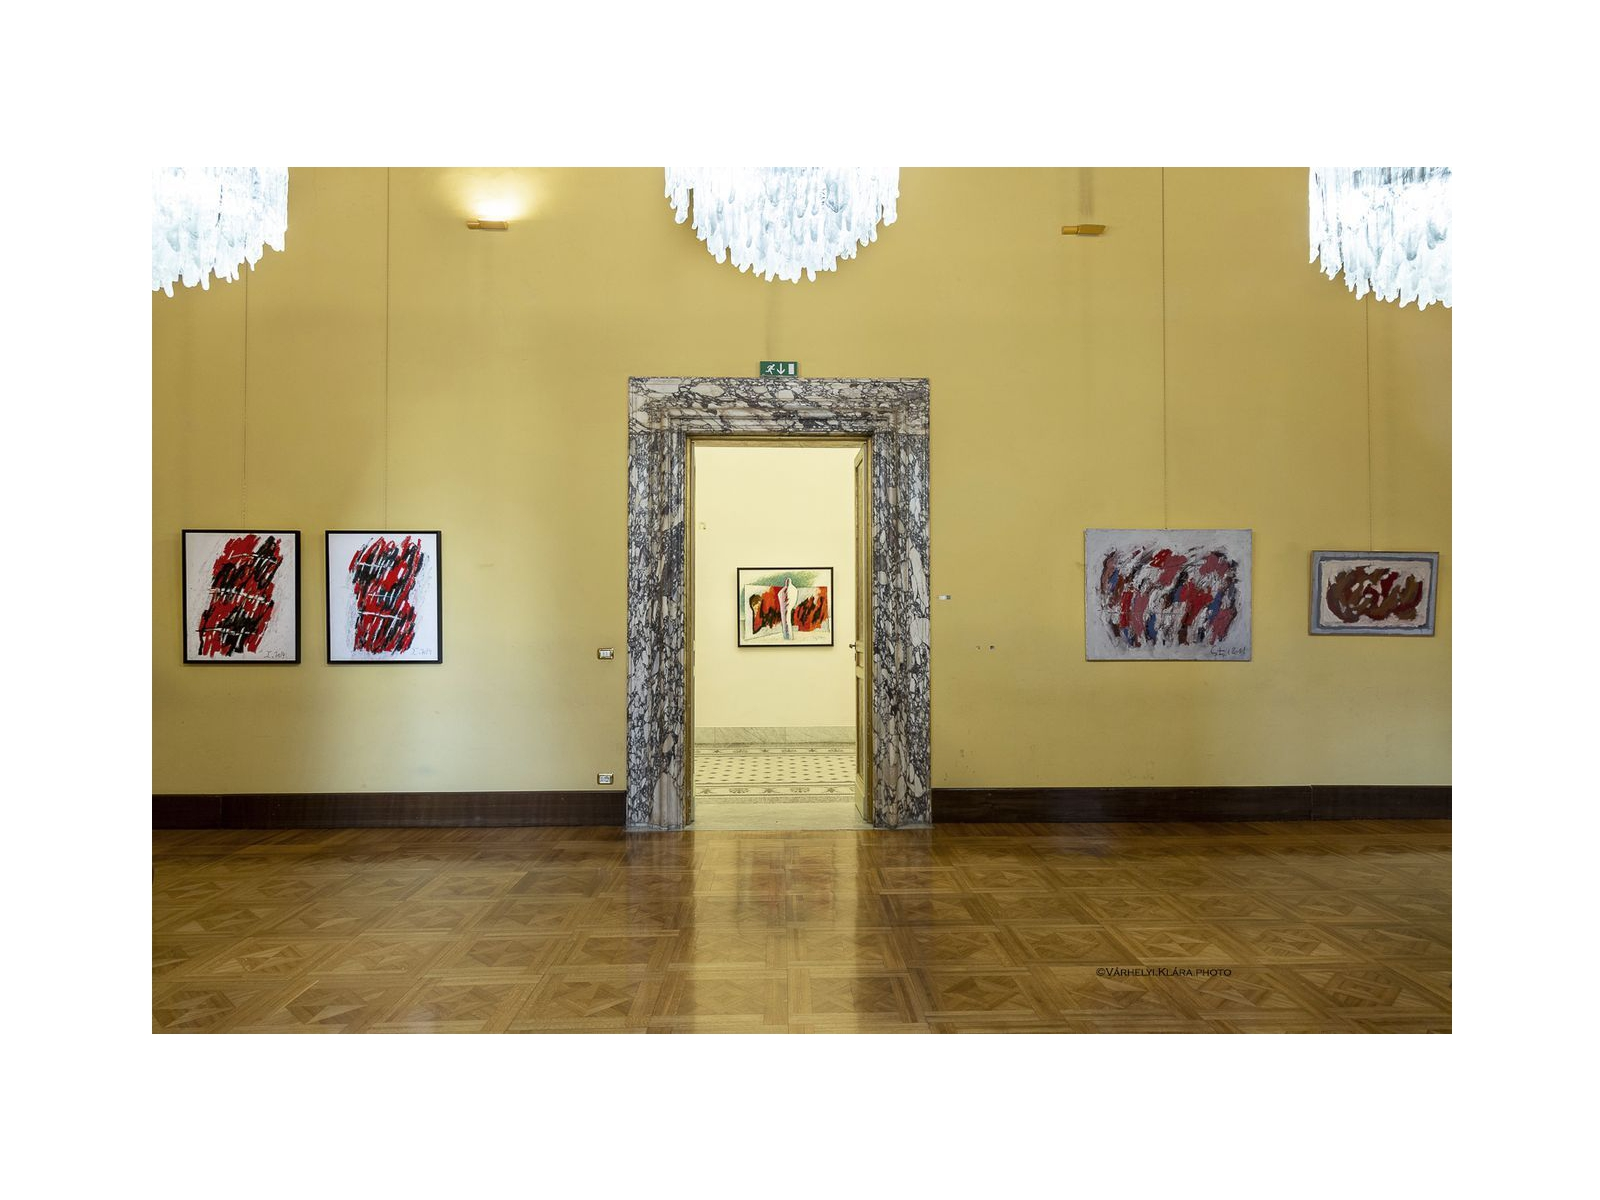 Karl-Stengel.-Con-cuore-puro.-Exhibition-view-at-Accademia-dUngheria-Roma-2020.-Photo-Klára-Várhelyi-_1_